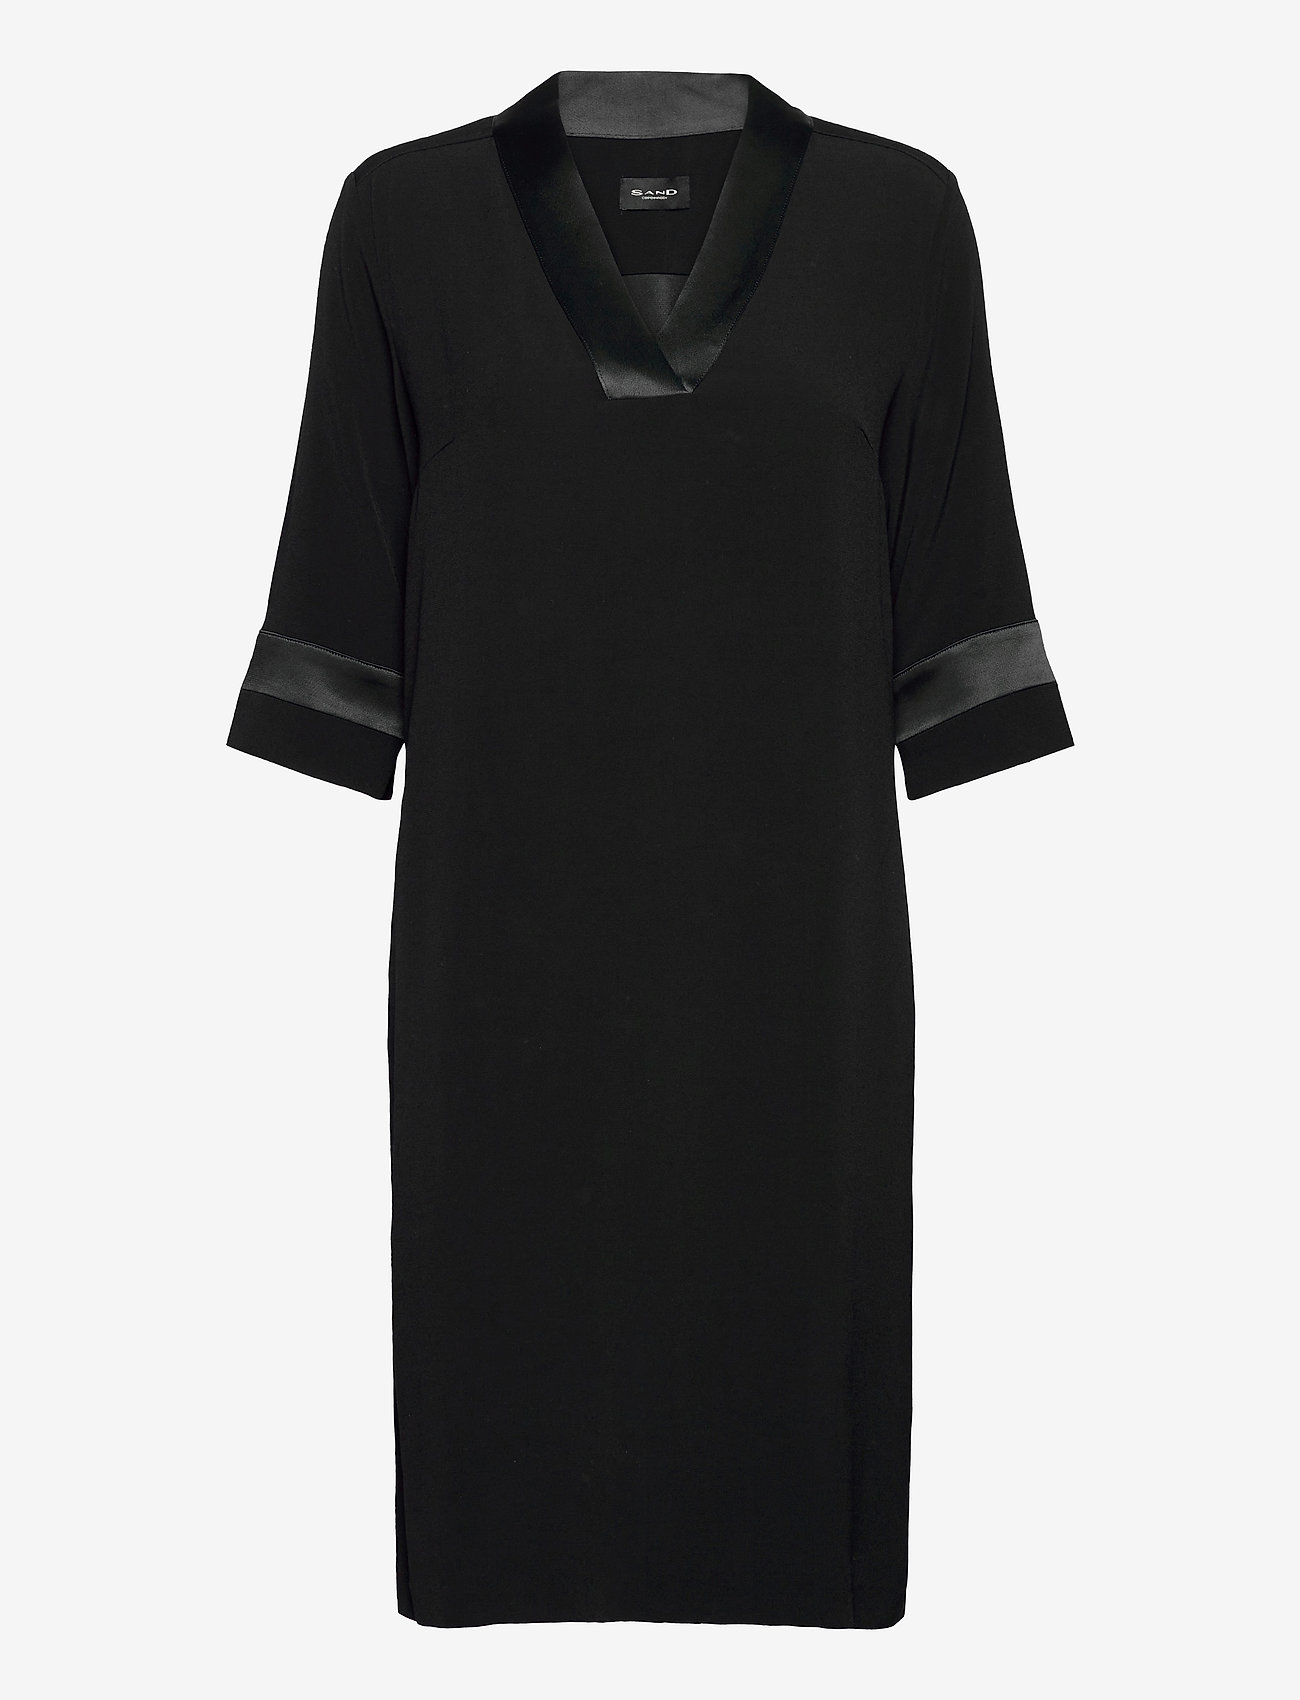 SAND - Crepe Satin Back - Ambar - robes de jour - black - 0